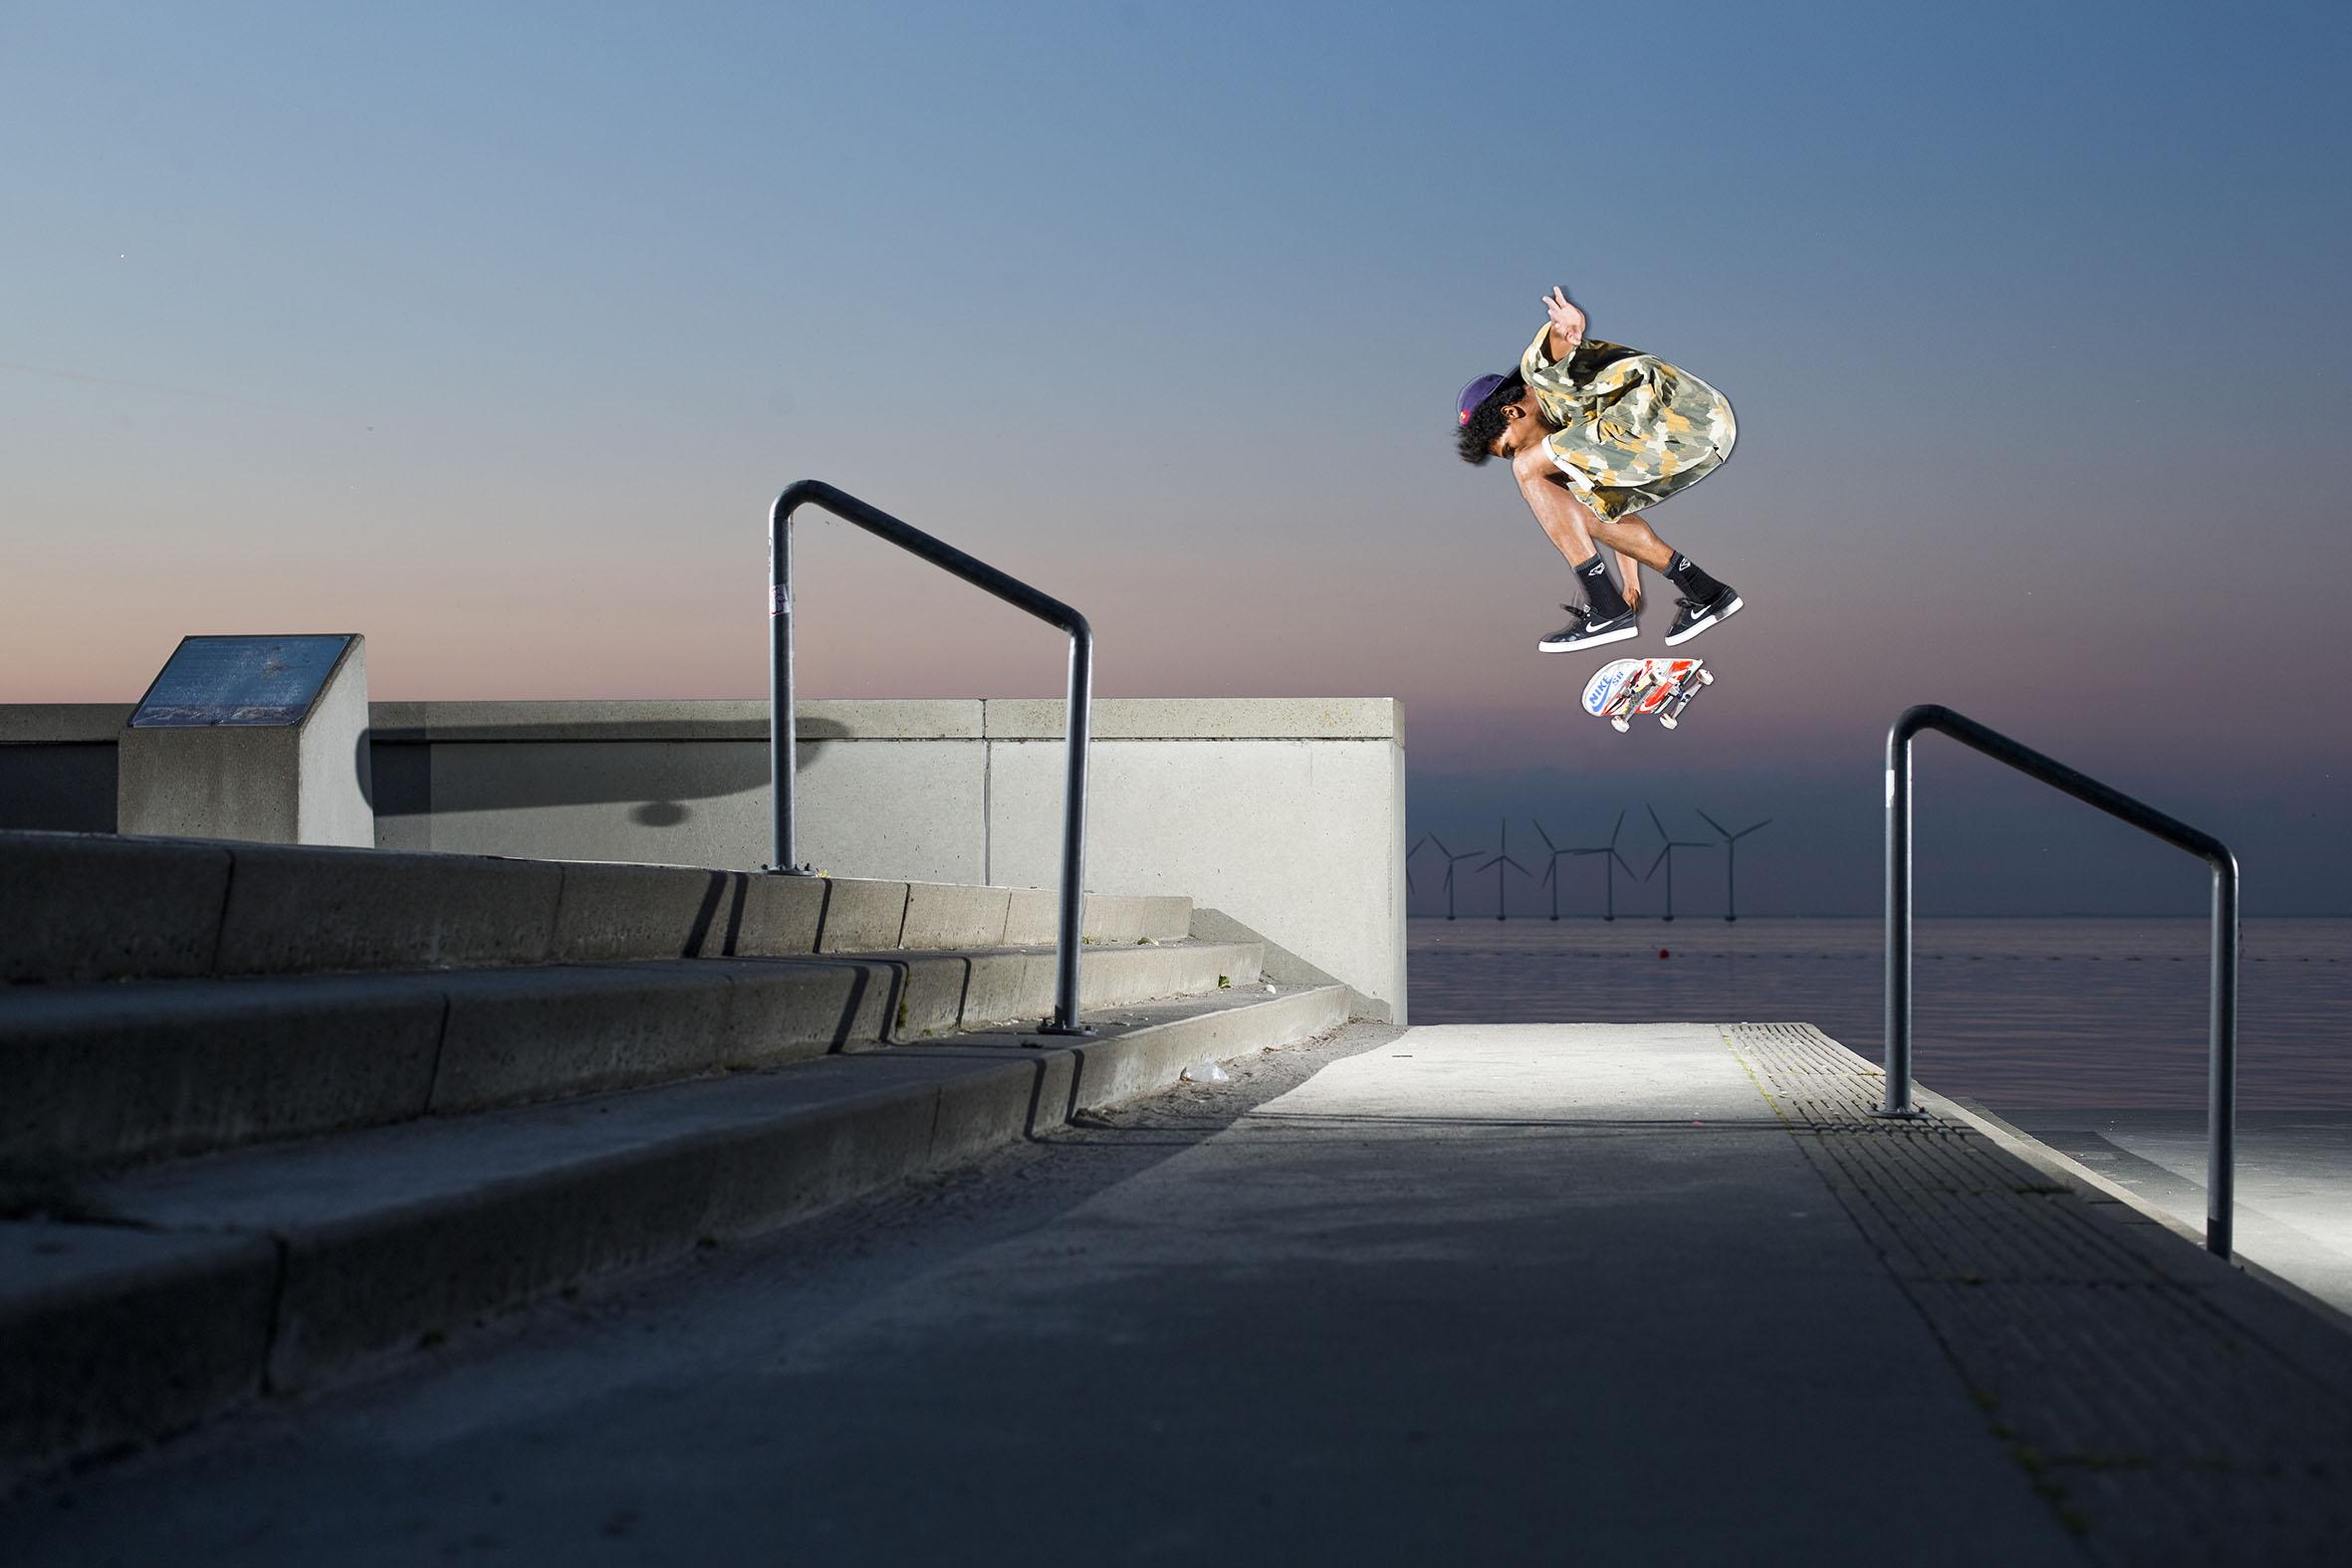 Korahn Gayle - switch backside flip